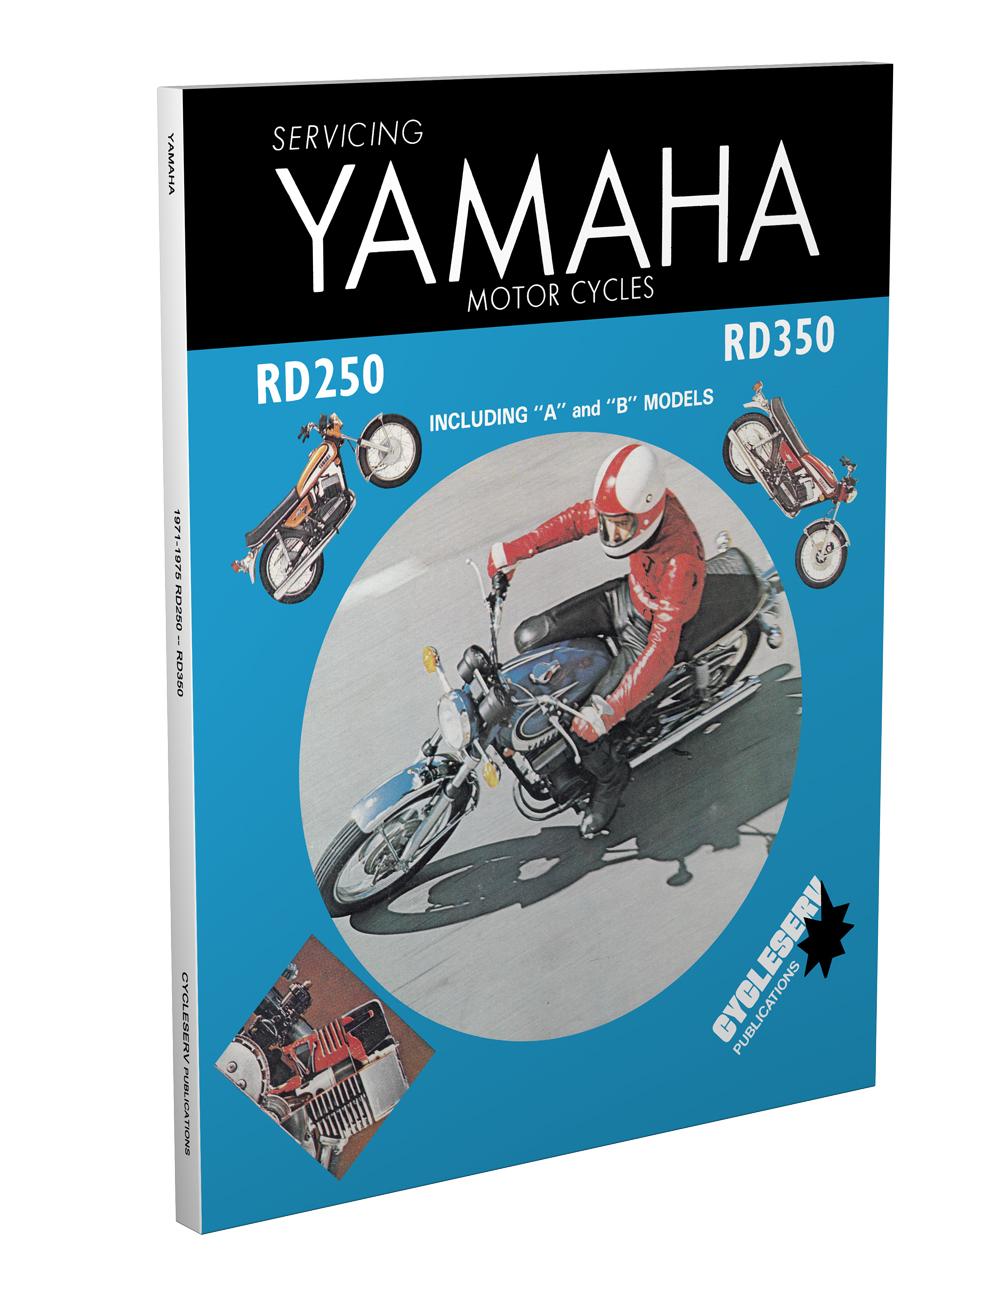 1971 1975 Yamaha Cycleserv Repair Shop Manual Motorcycle Rd250 Rd350 Rd200 Wiring Diagram 1974 1976 Rd125